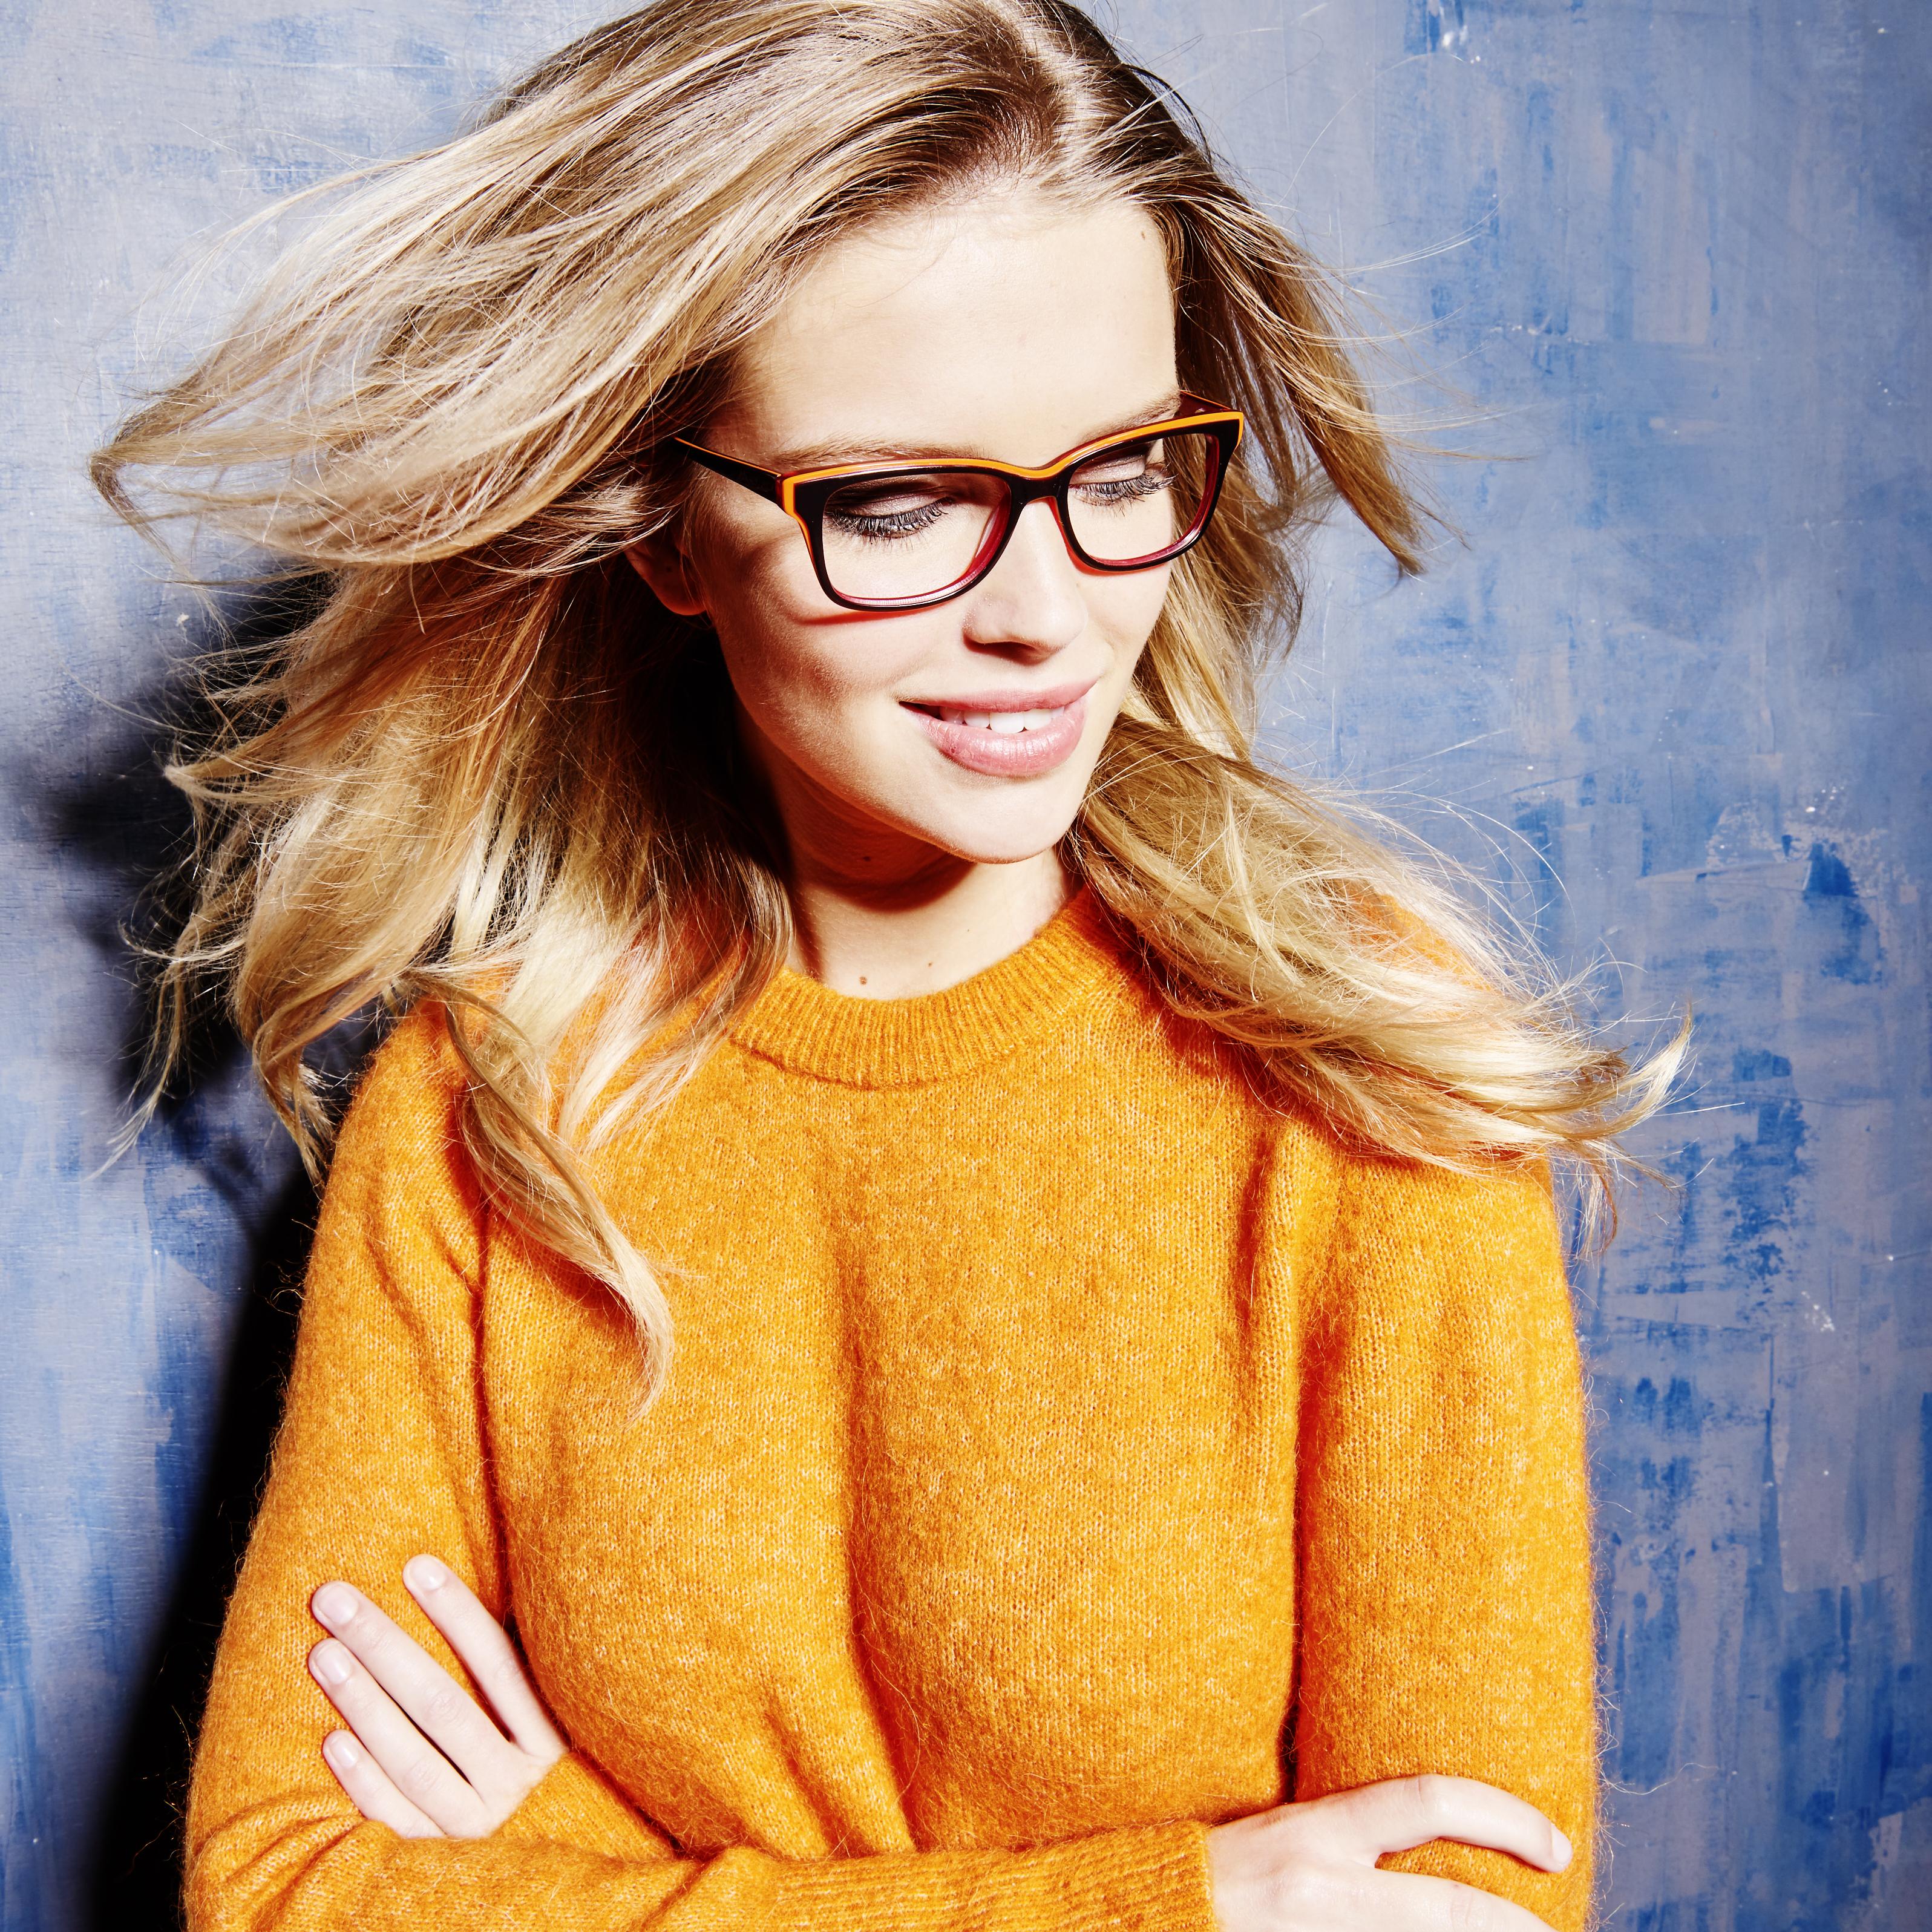 Studio-51|Brillen|Damenbrille|Optik